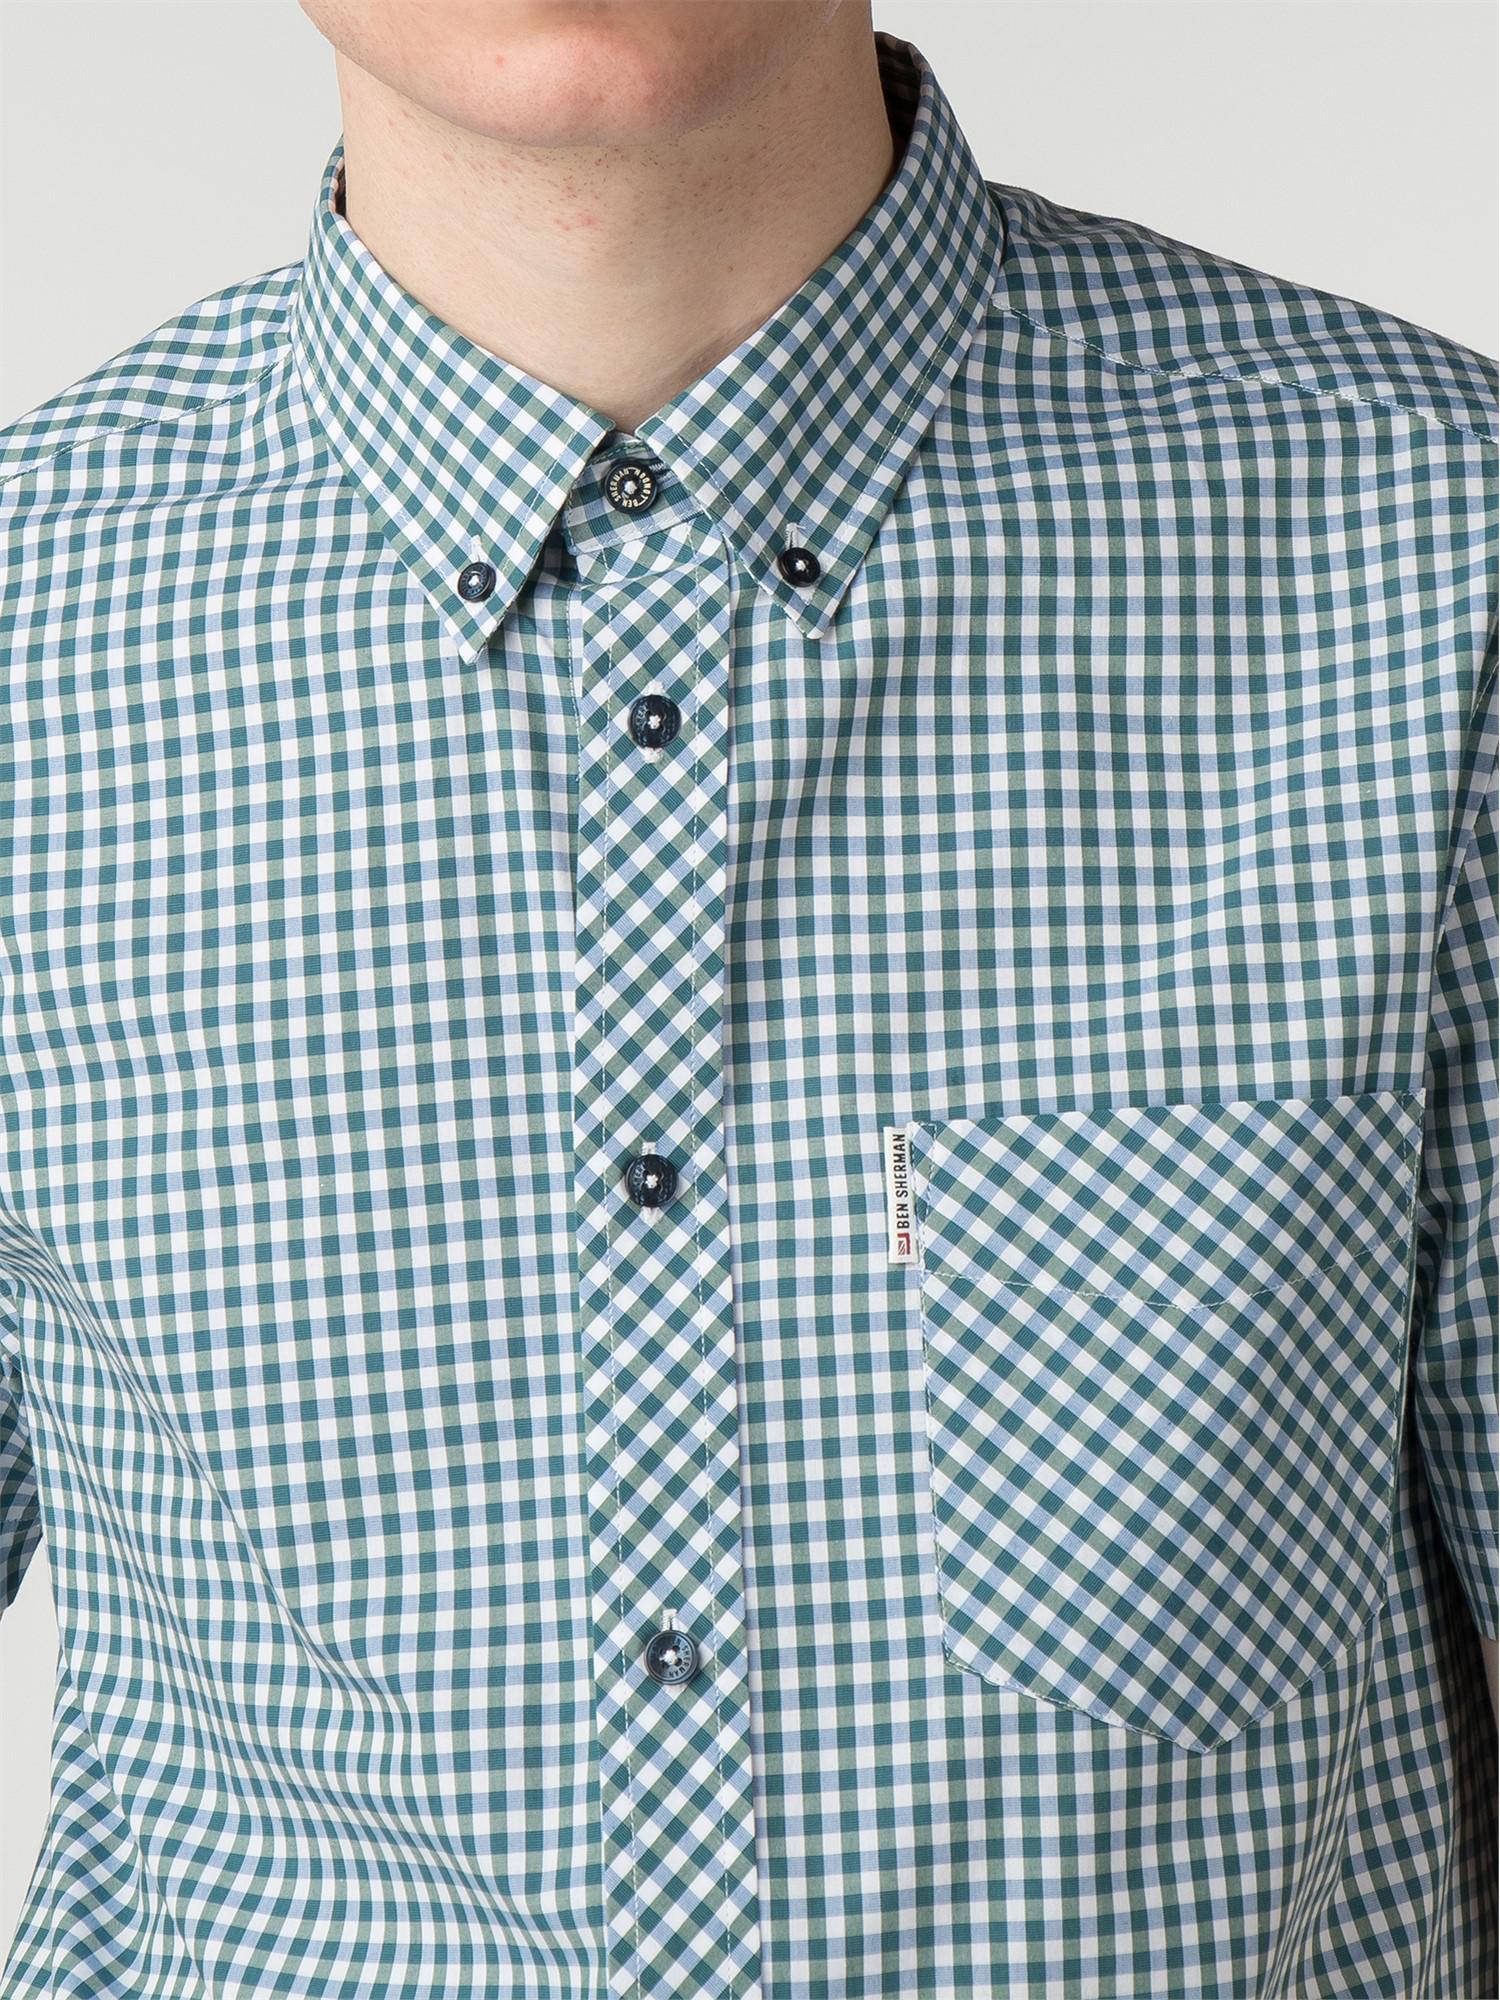 Ben Sherman Check Short Sleeve Shirt Blue Depths 0049964